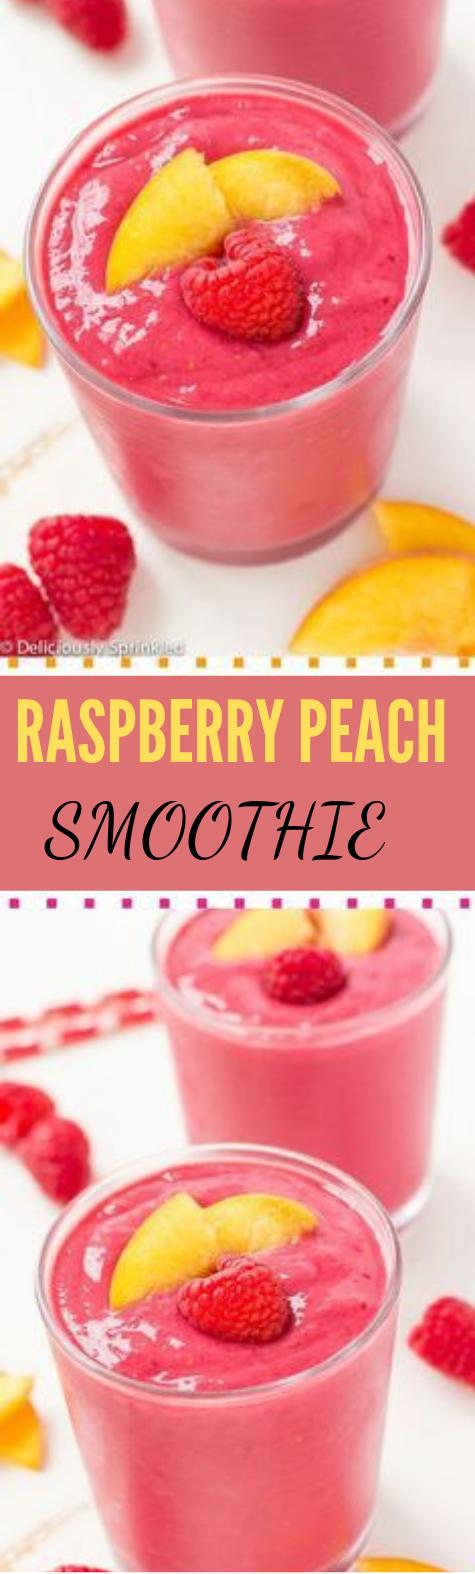 Raspberry Peach Smoothie #smoothie #drink